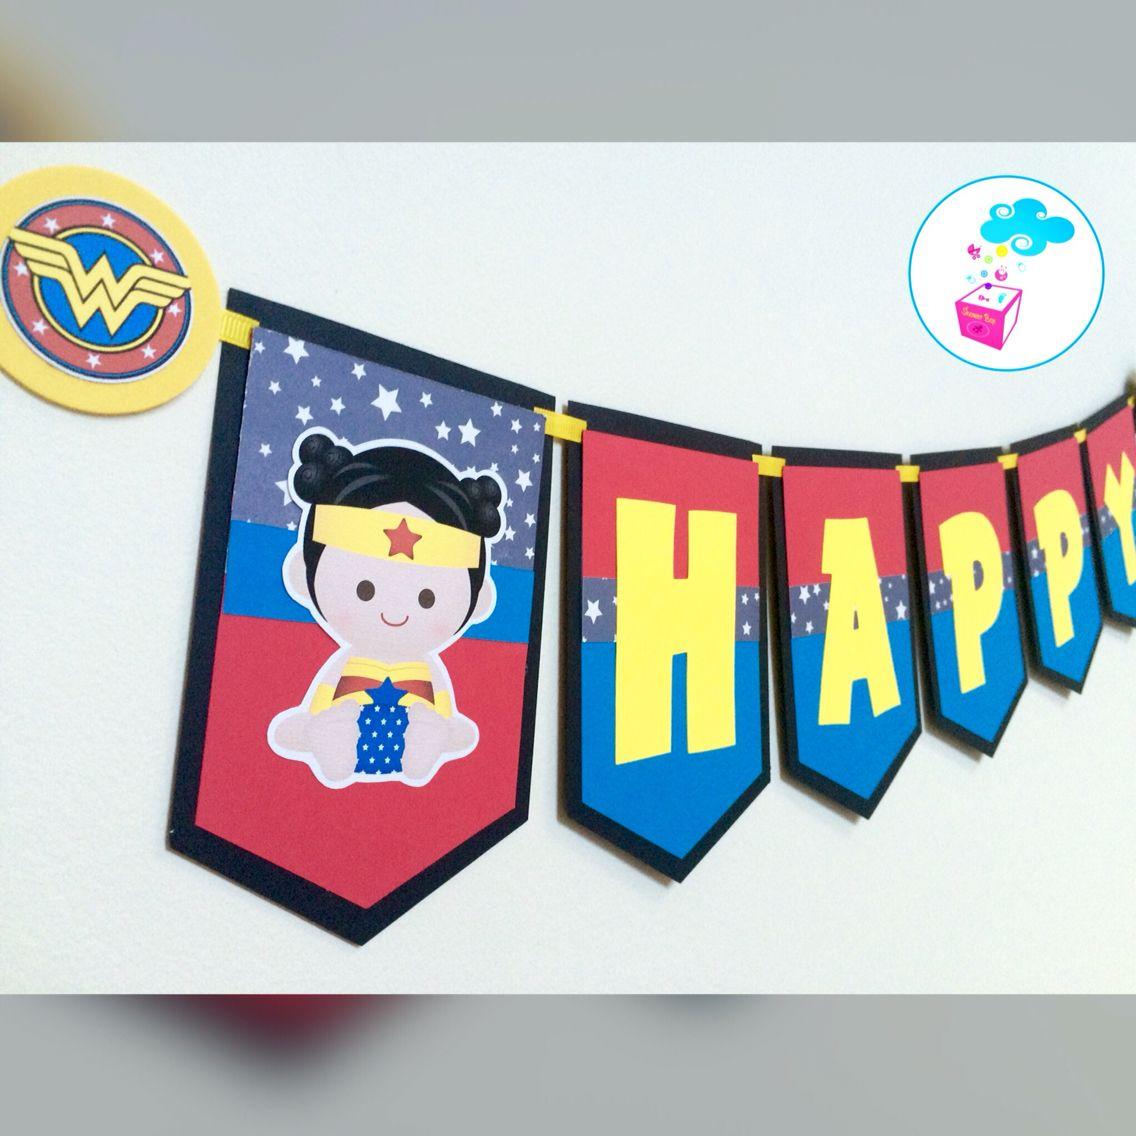 Baby superheroes banner Showerbox Desing www.myshowerbox.com Like us on FB